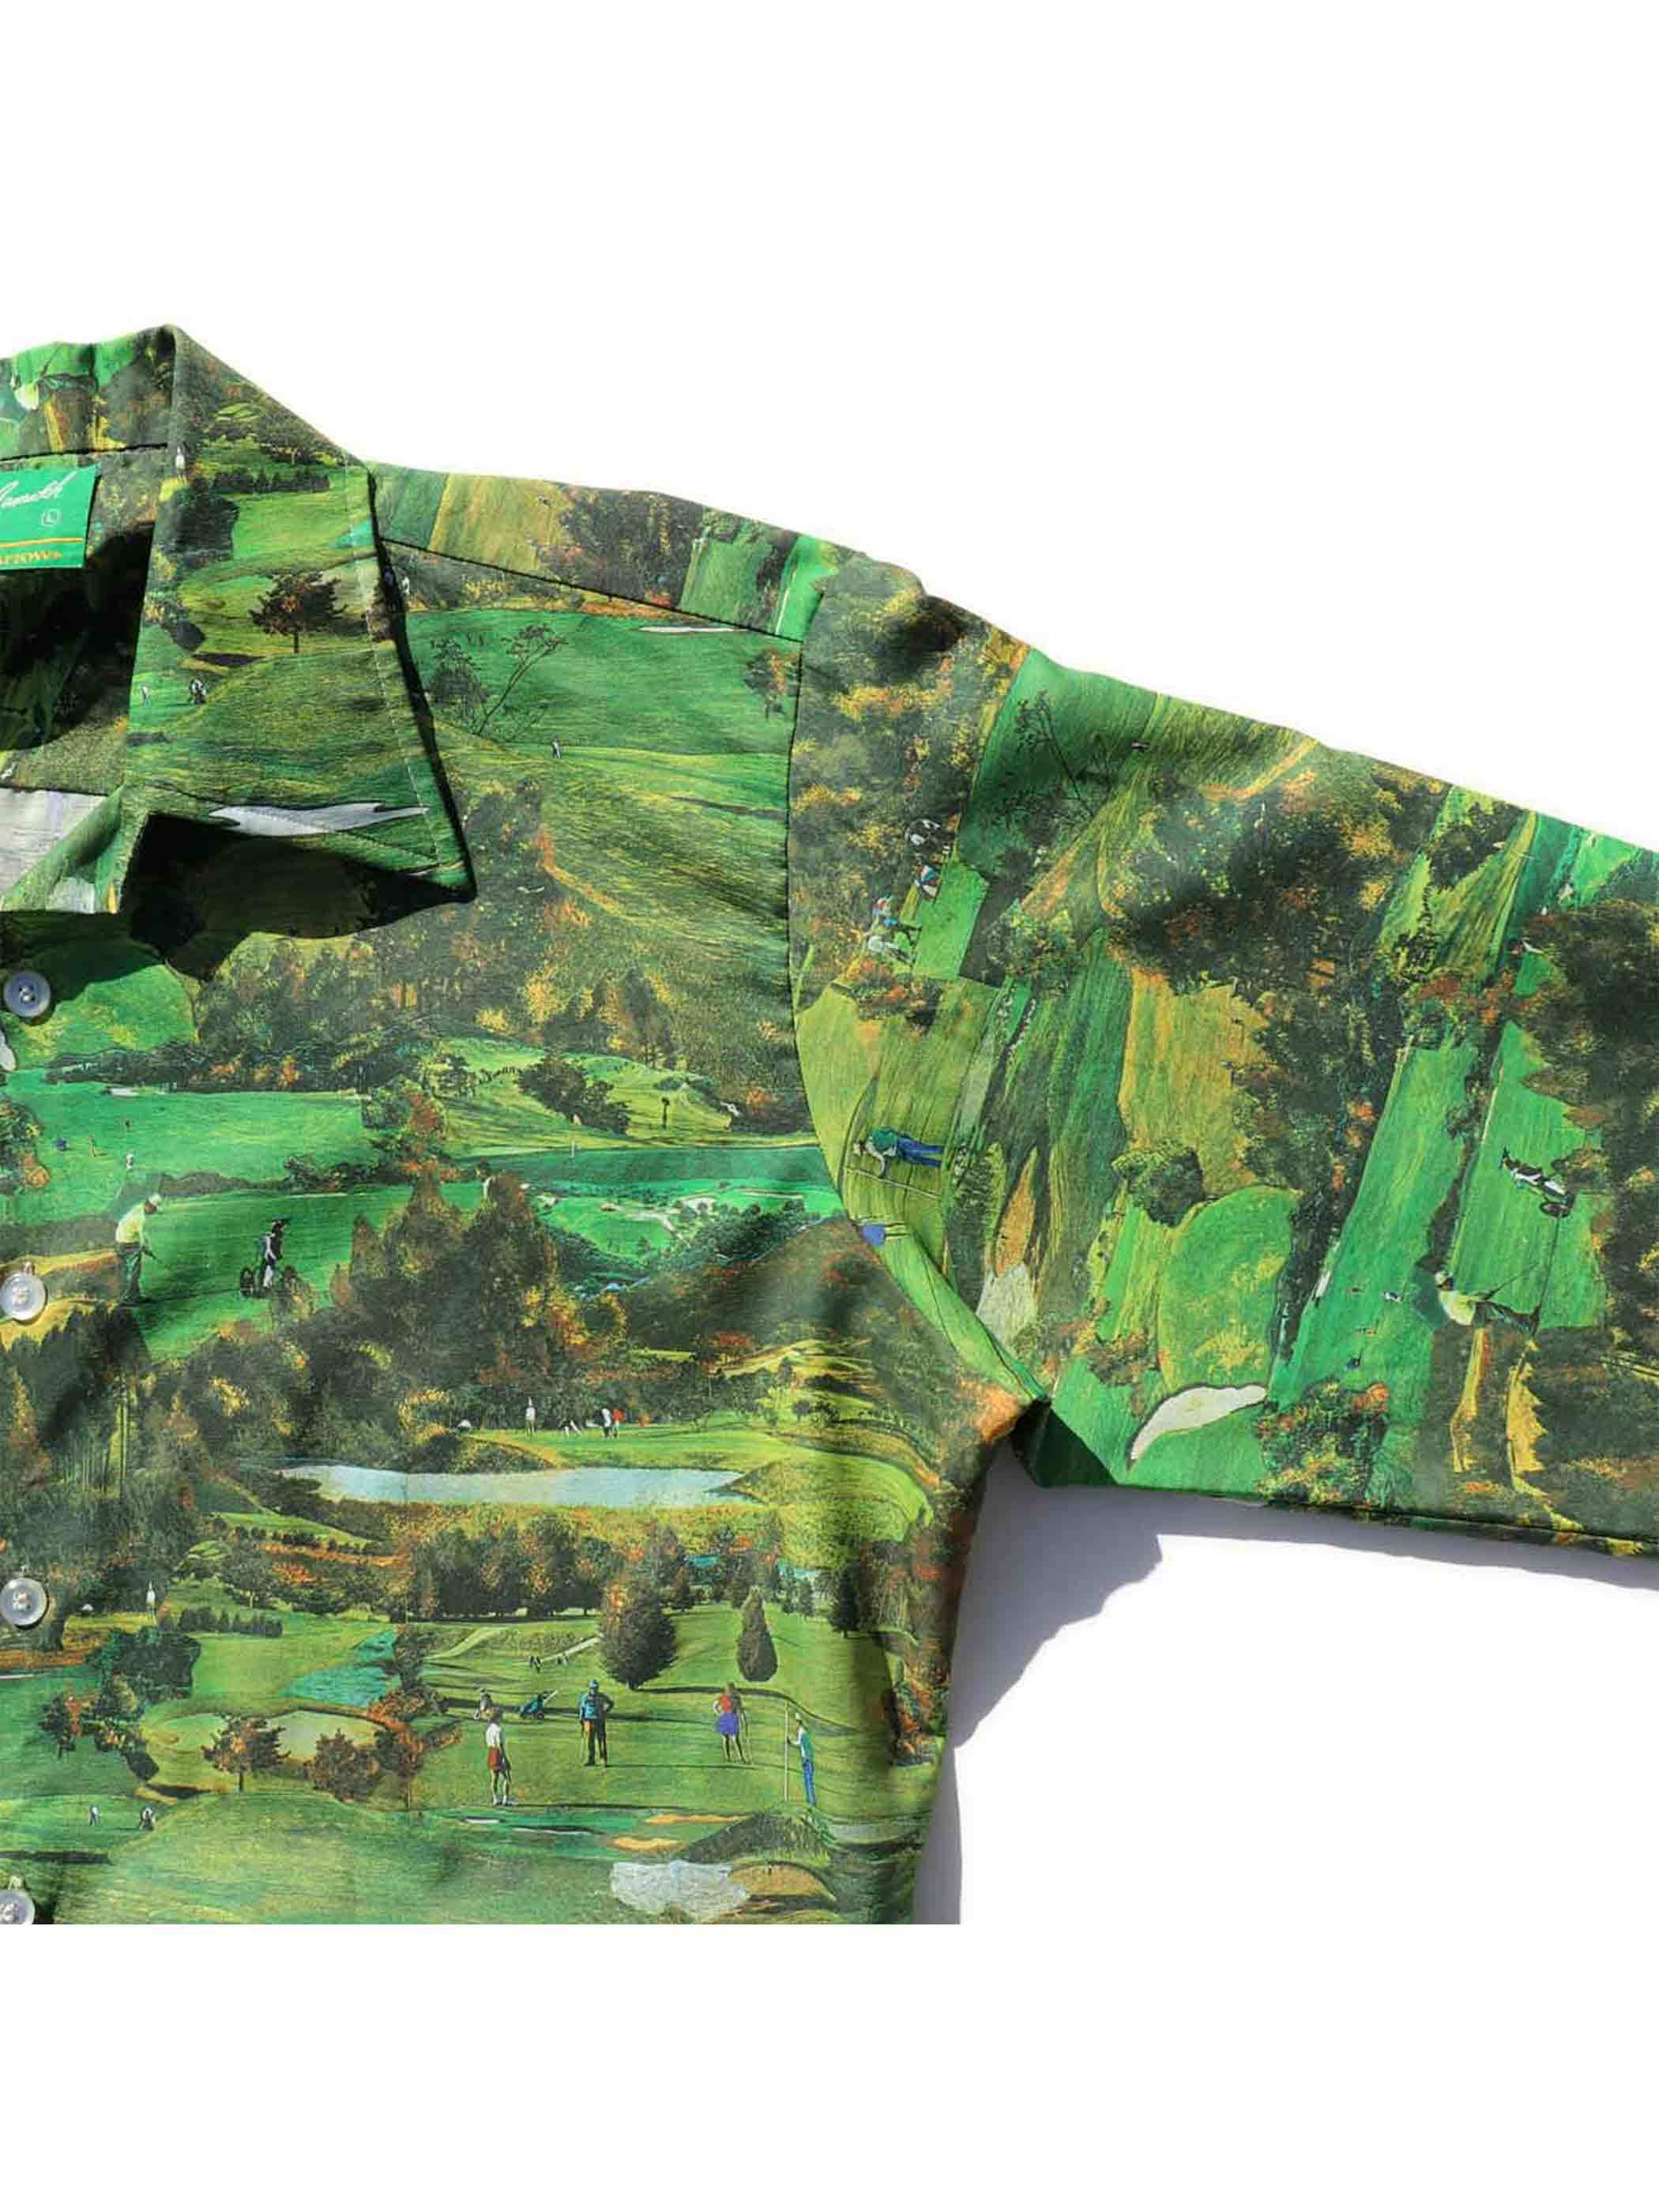 70's JOE NAMATH BY ARROW ゴルフ柄 転写プリントシャツ [L]